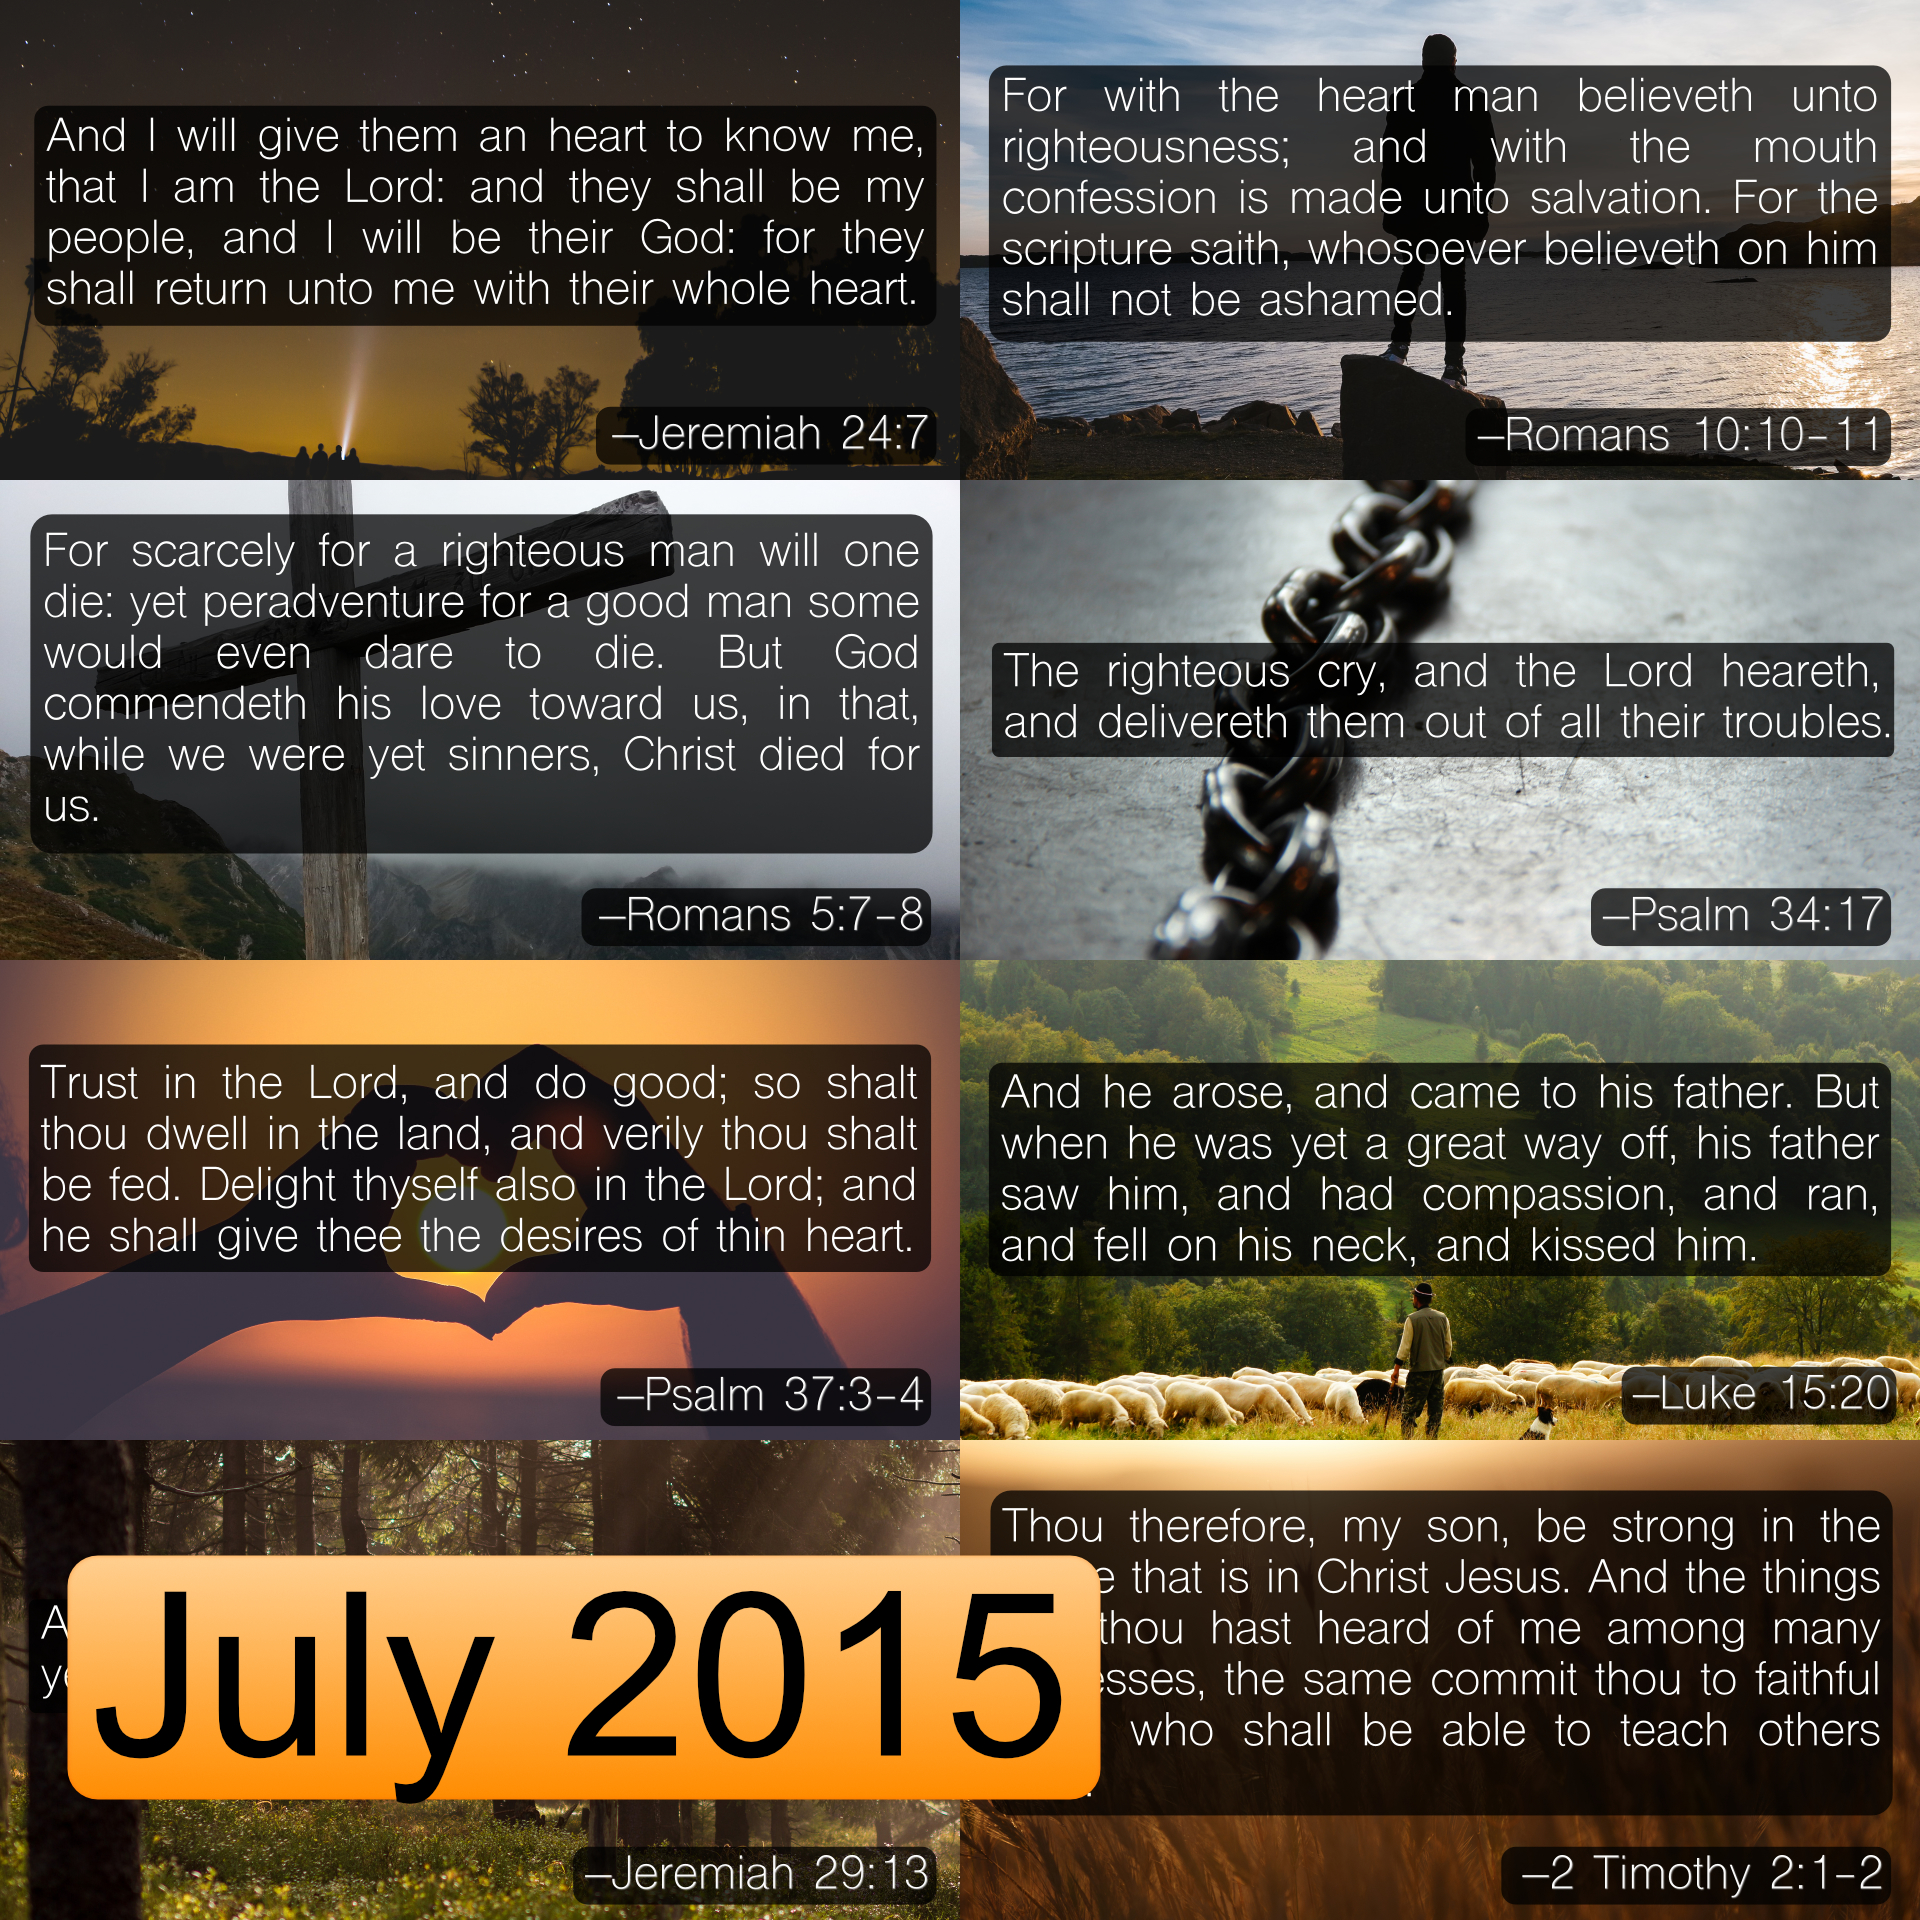 July 2015 Image Pack